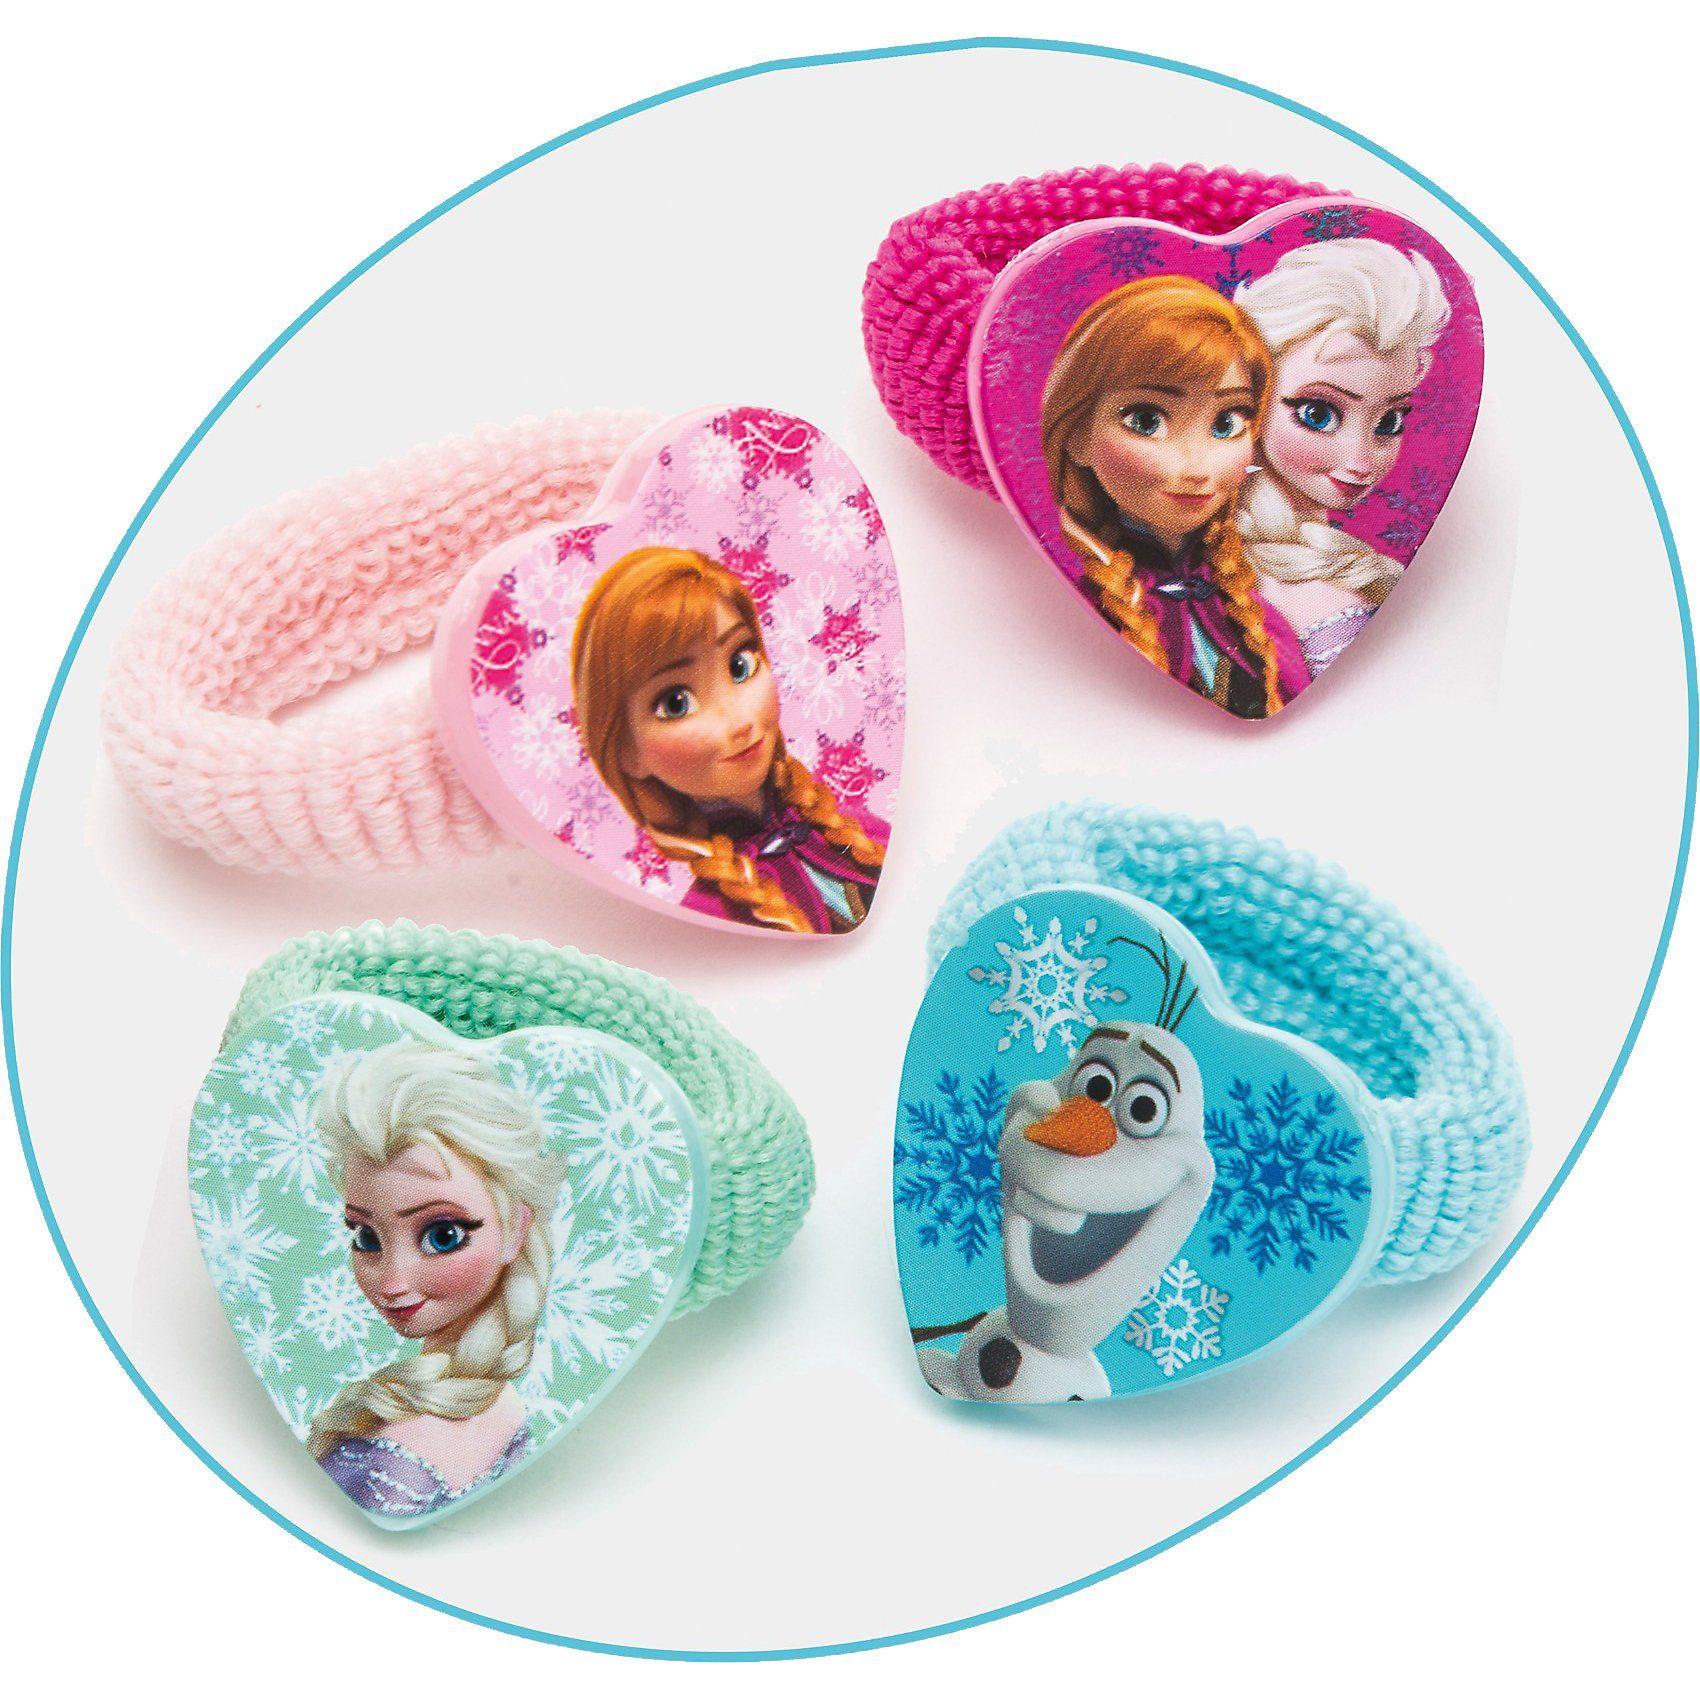 JOY TOY Zöpfchenhalter Disney Princess Frozen, 4 Motive